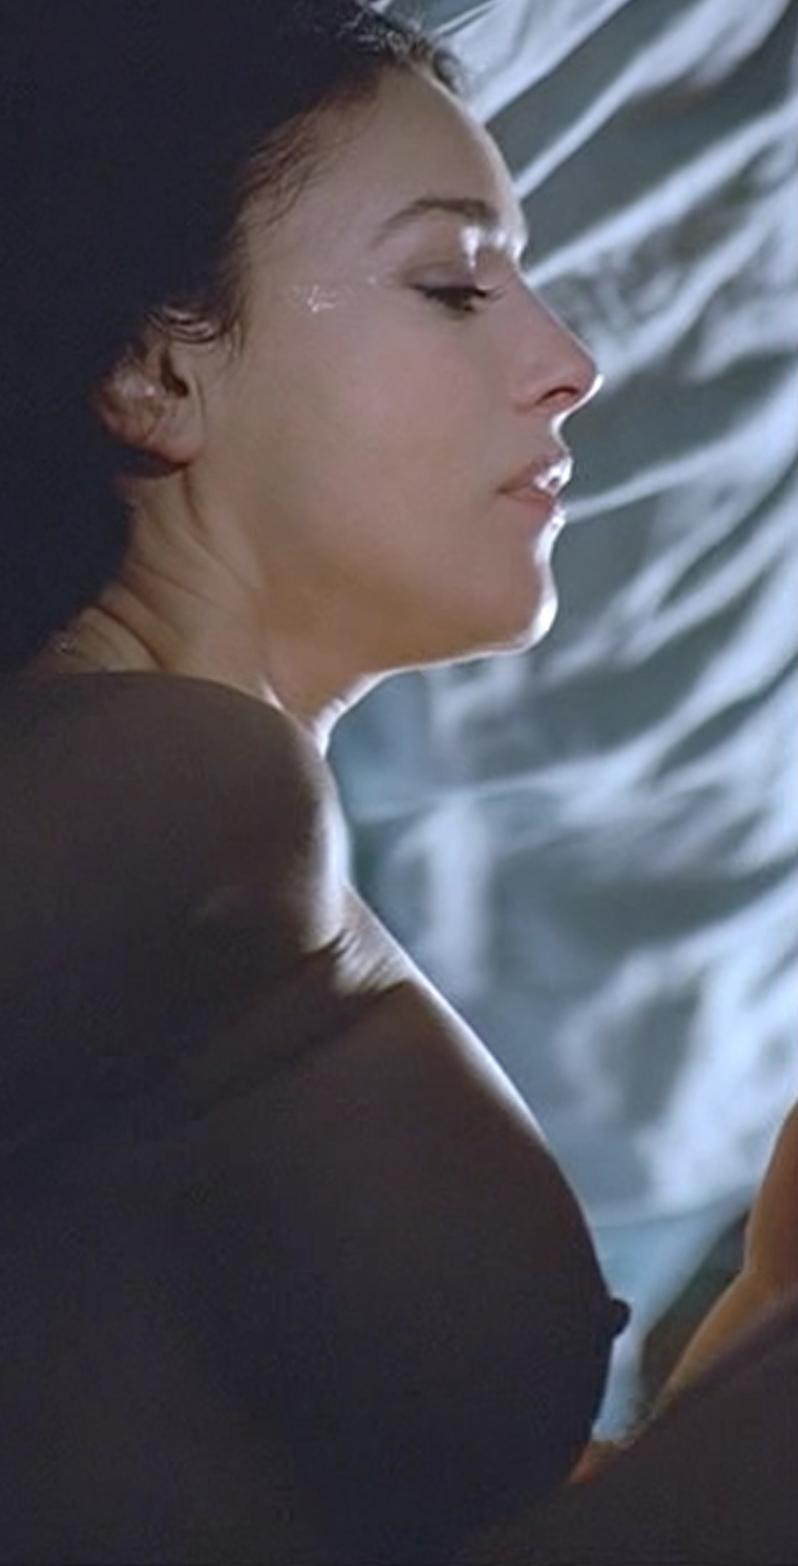 Monica bellucci boobs combien tu maimes scandalplanetcom - 4 9